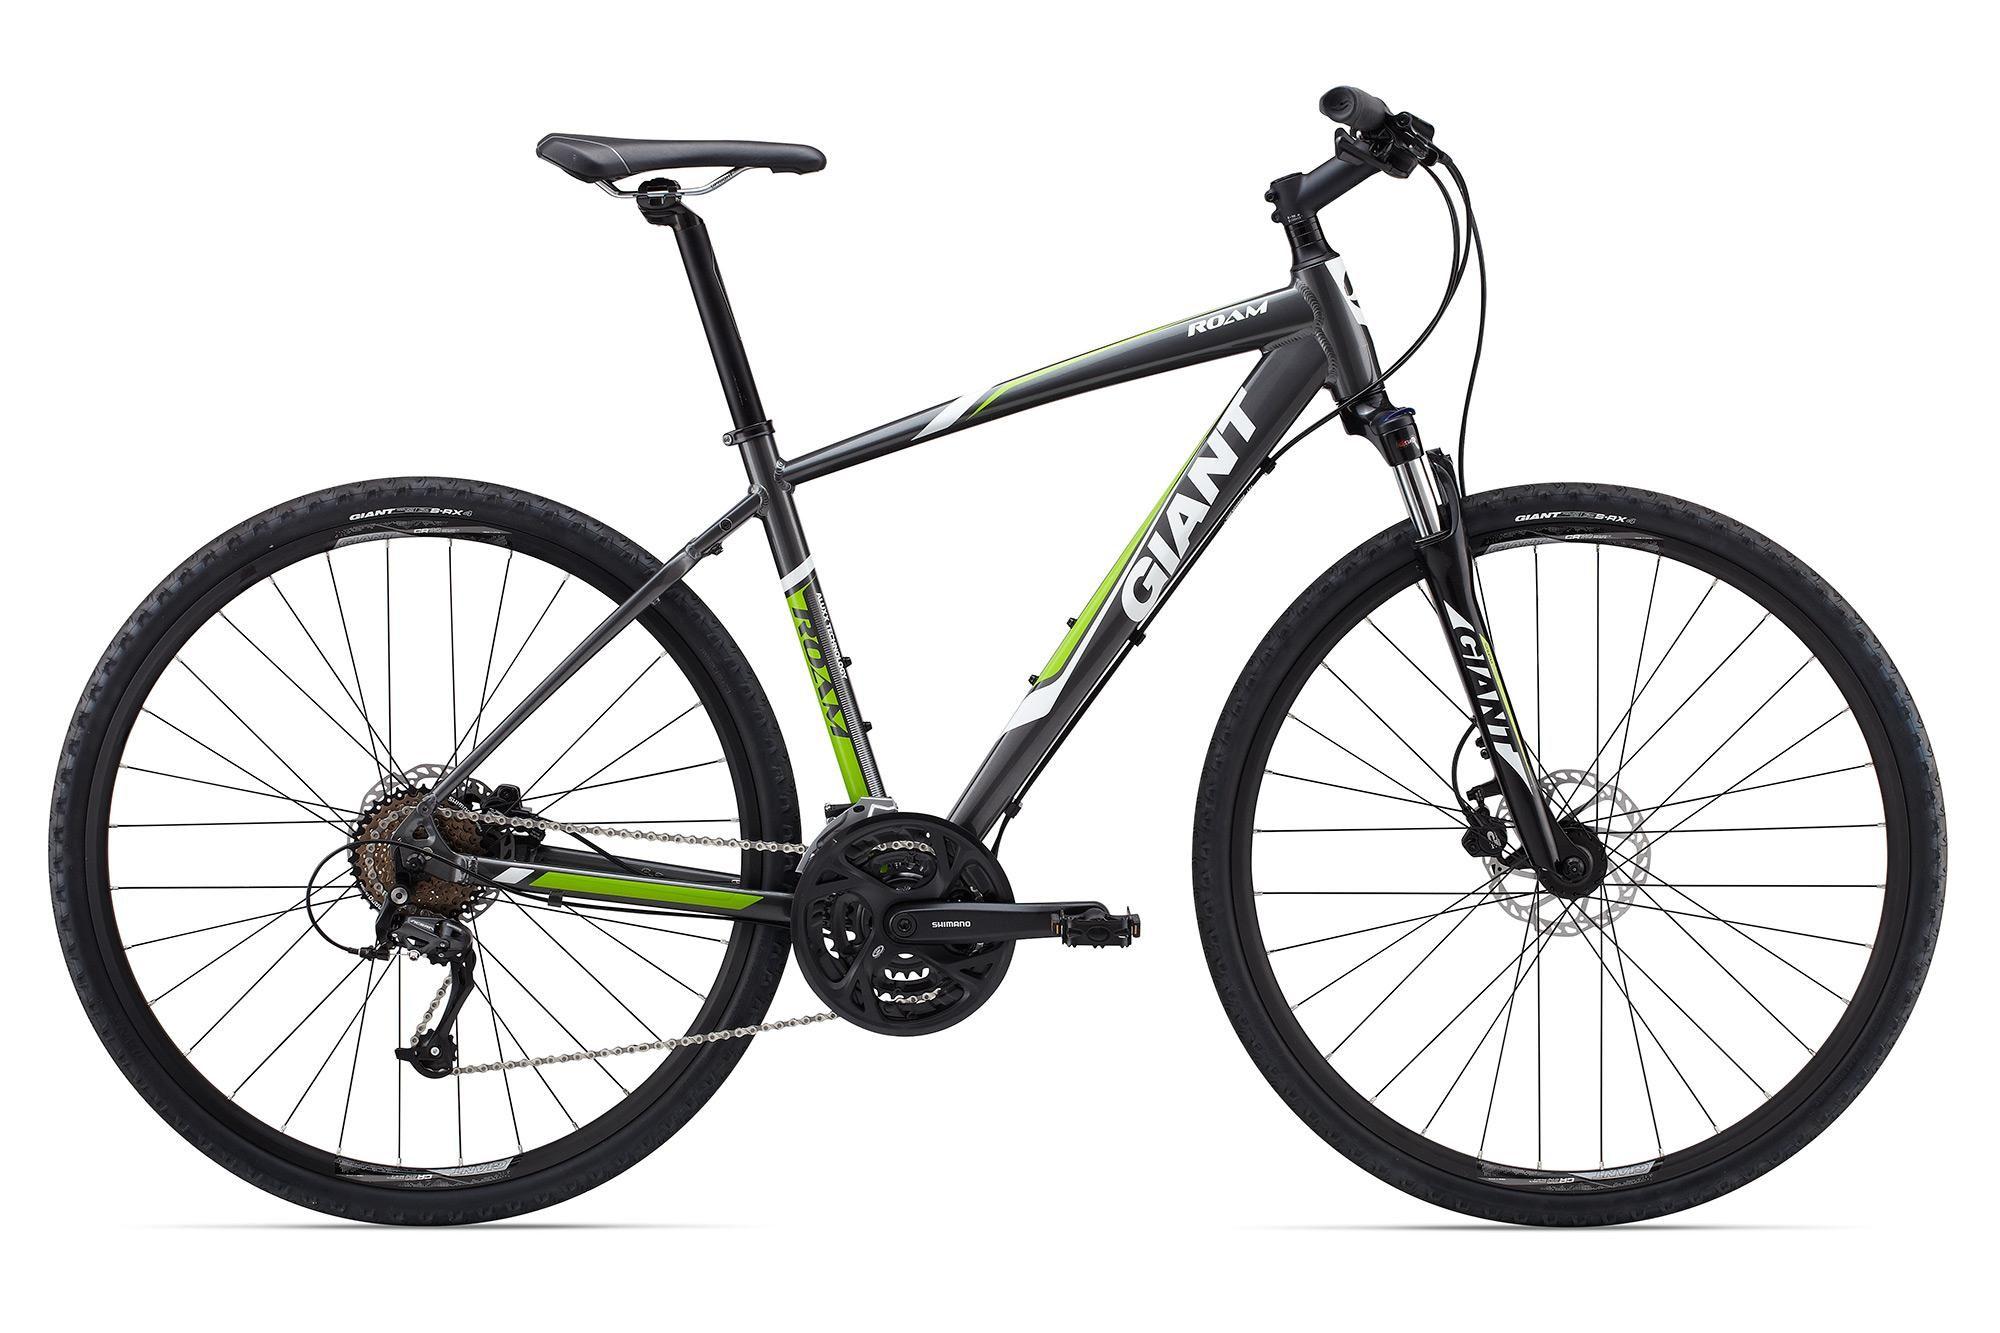 Roam 2 2015 Giant Bicycles Canada Giant Bicycles Hybrid Bike Adventure Bike